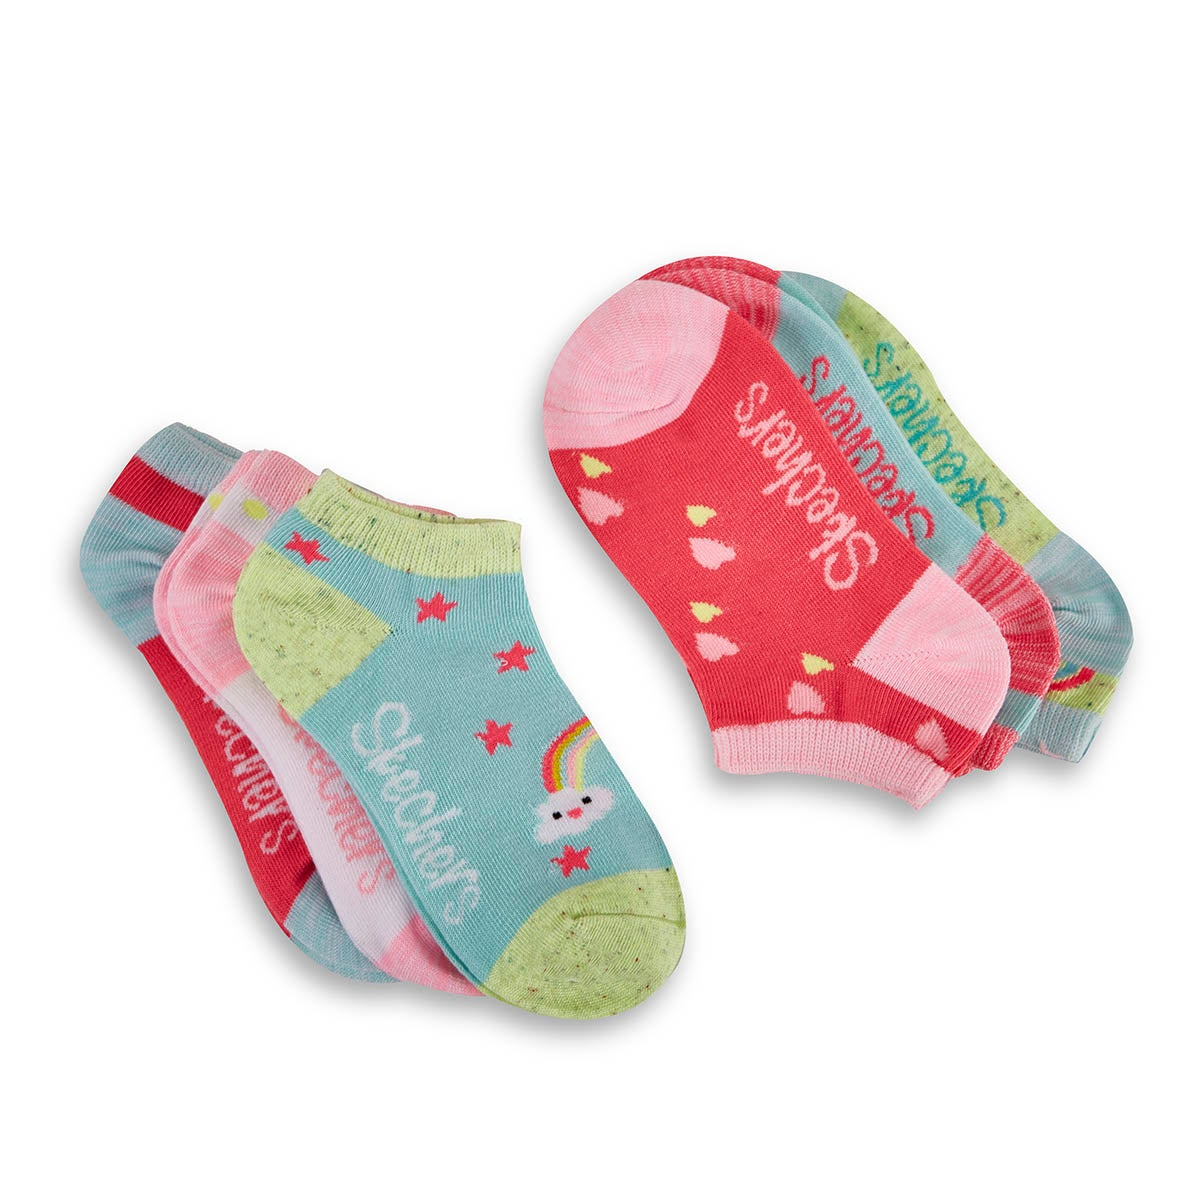 Girls' LOW CUT NON TERRY multi socks - 6pk